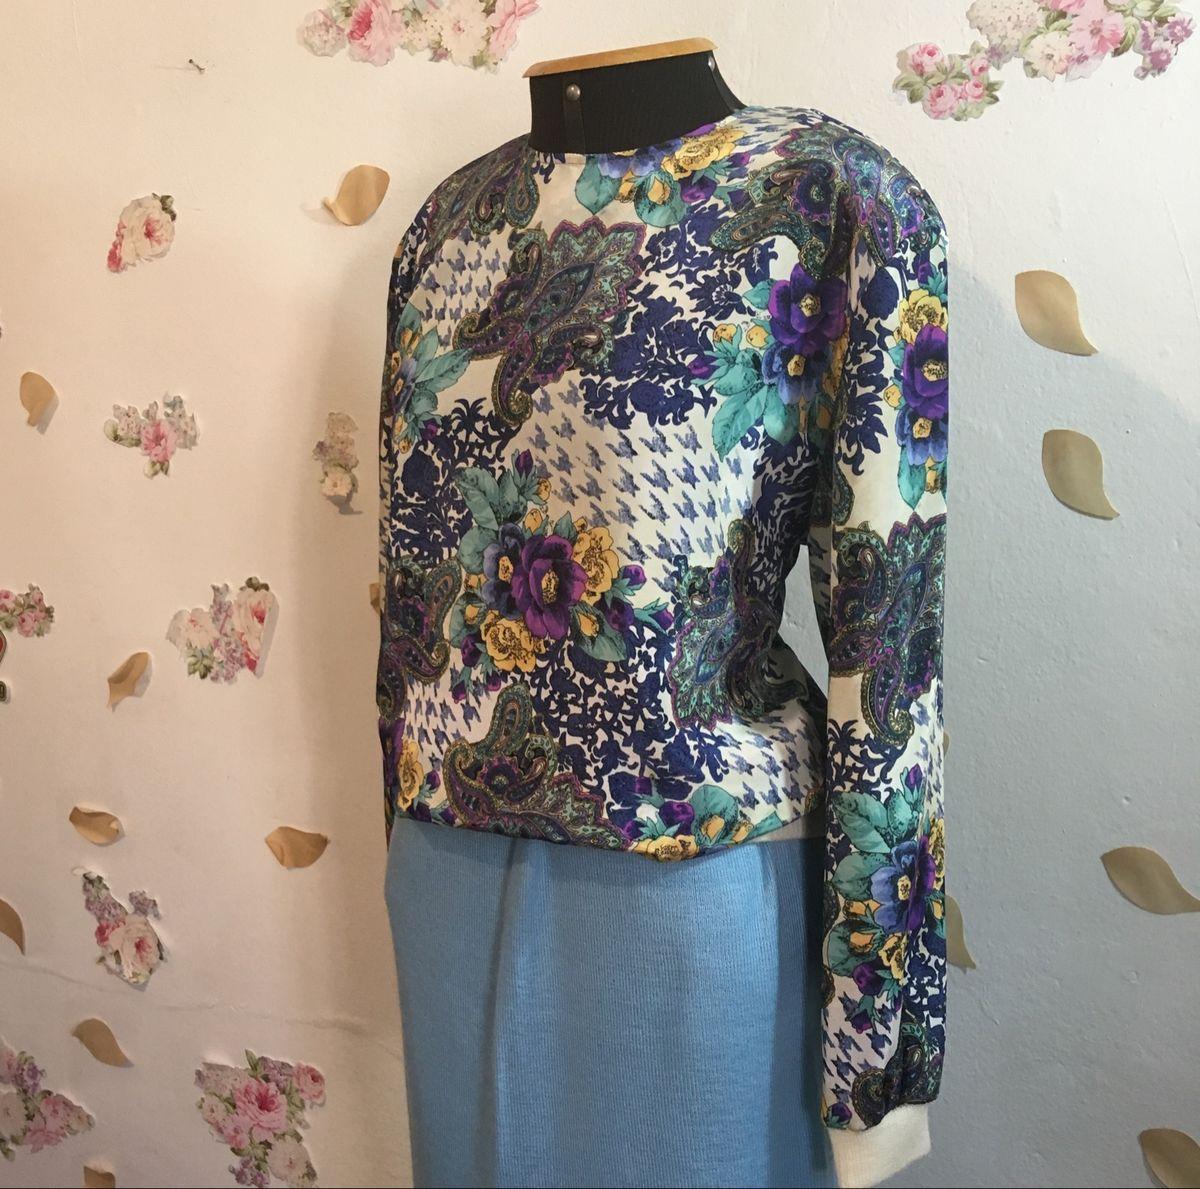 blusa vintage anos 80 - blusas sem marca